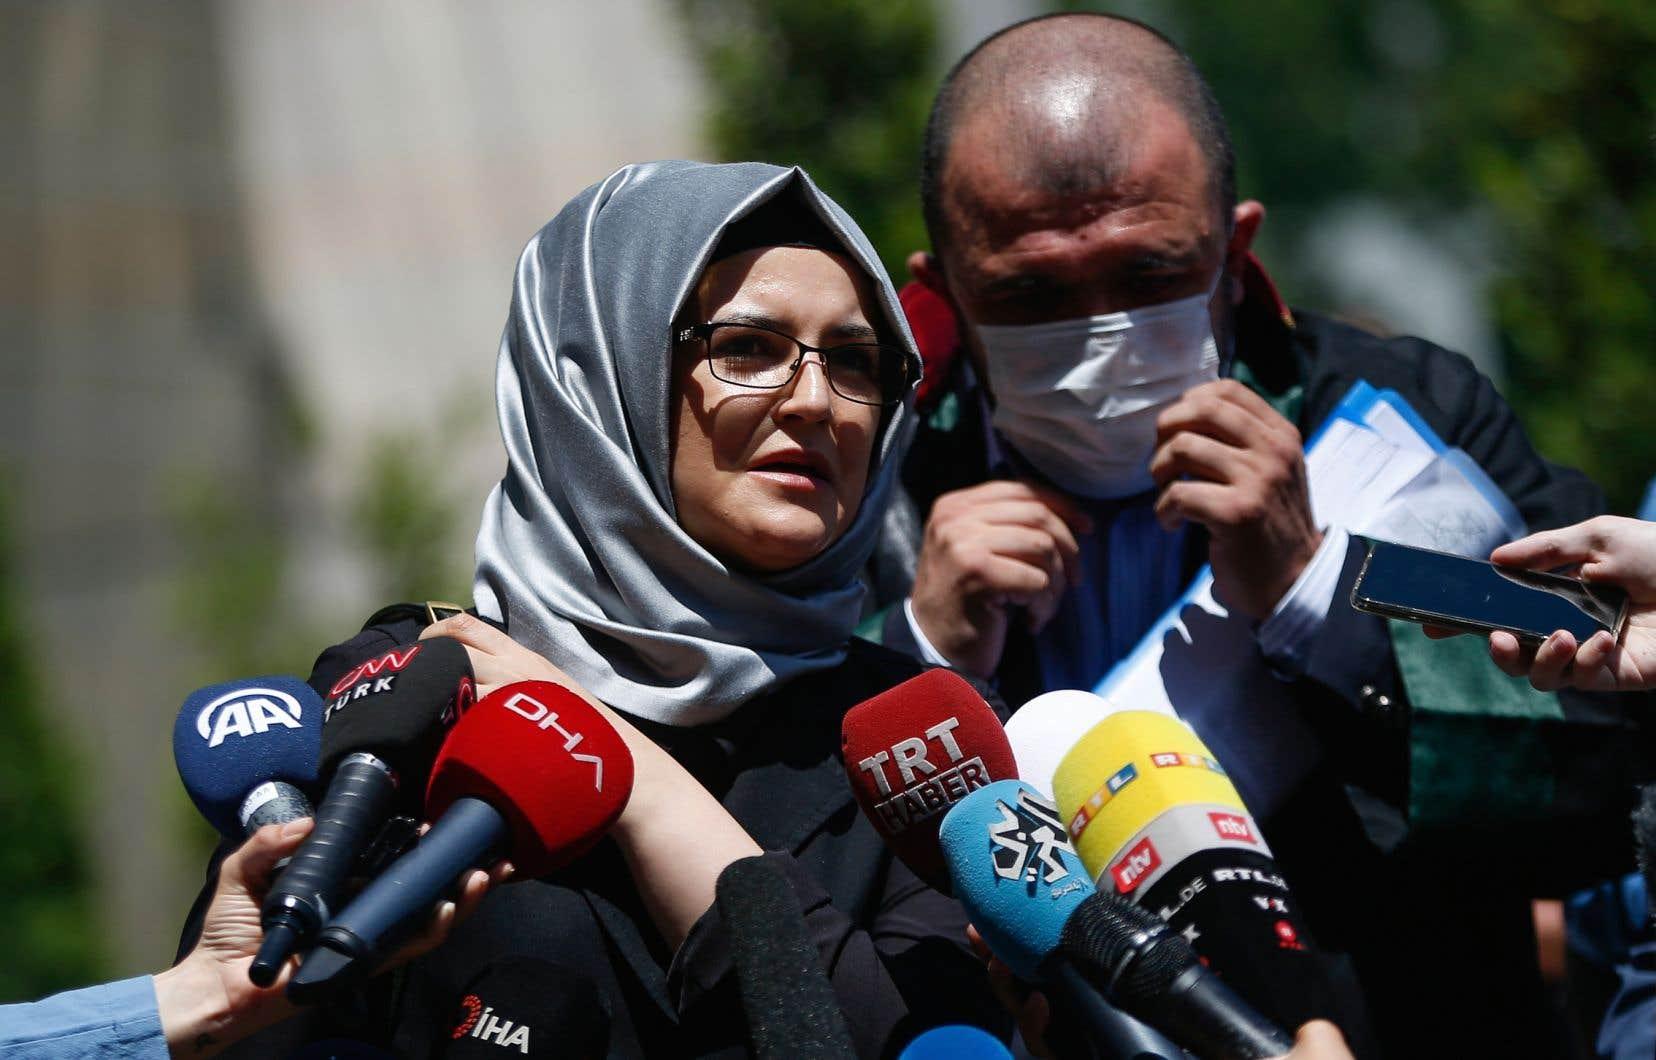 La fiancée de Jamal Khashoggi, Hatice Cengiz, lors d'une conférence de presse en juillet dernier